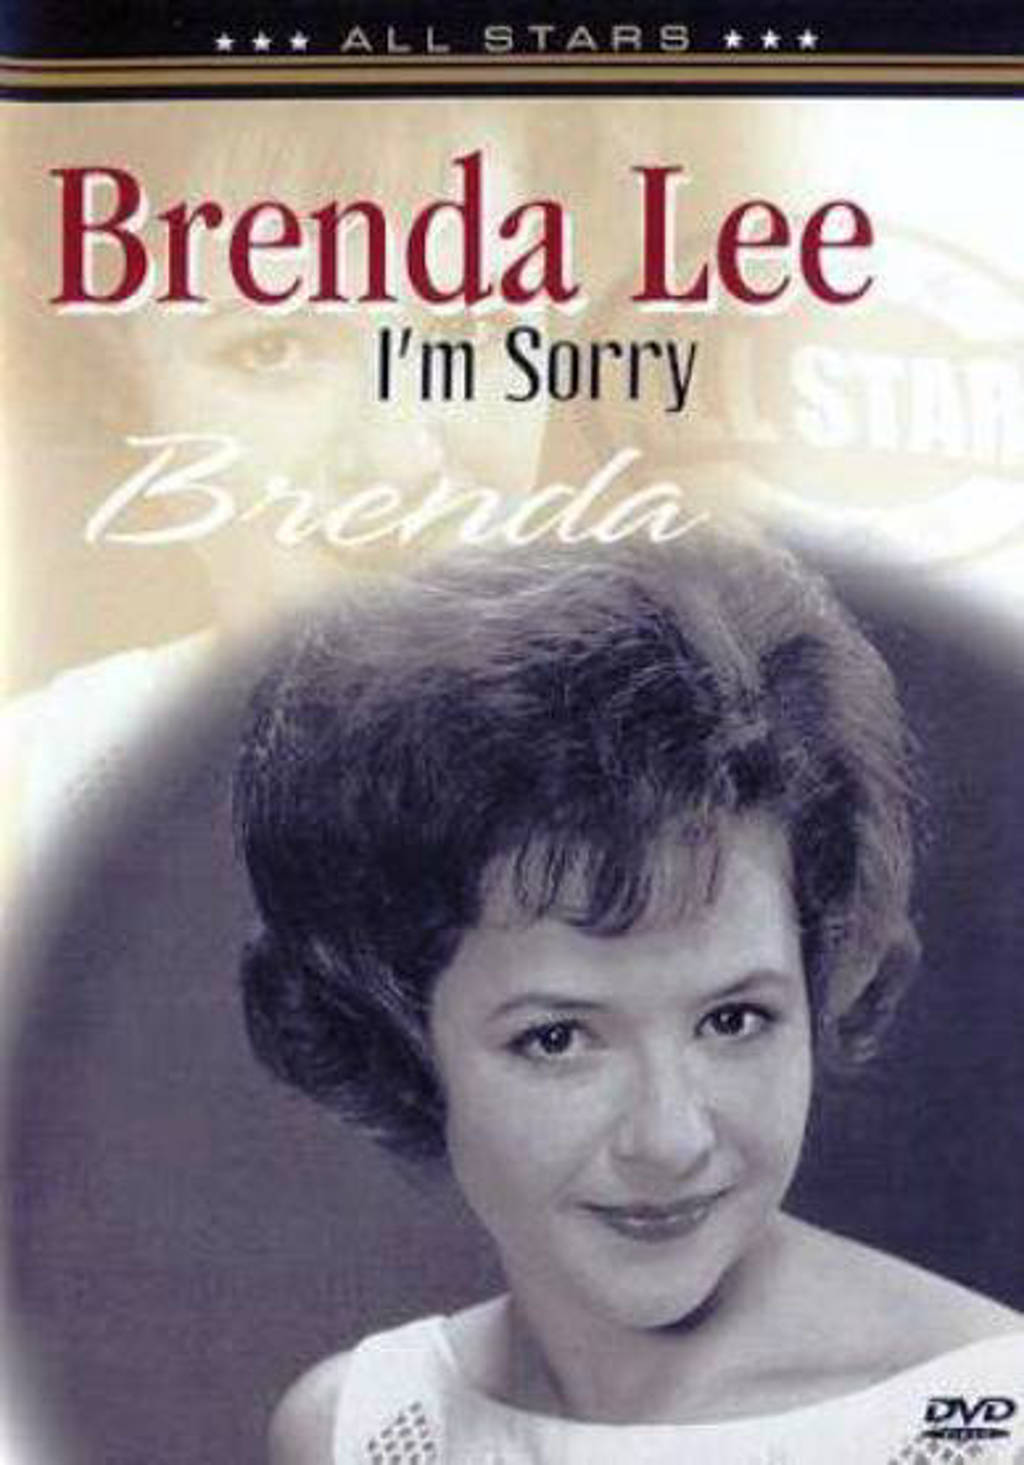 Brenda Lee - I'm sorry (DVD)